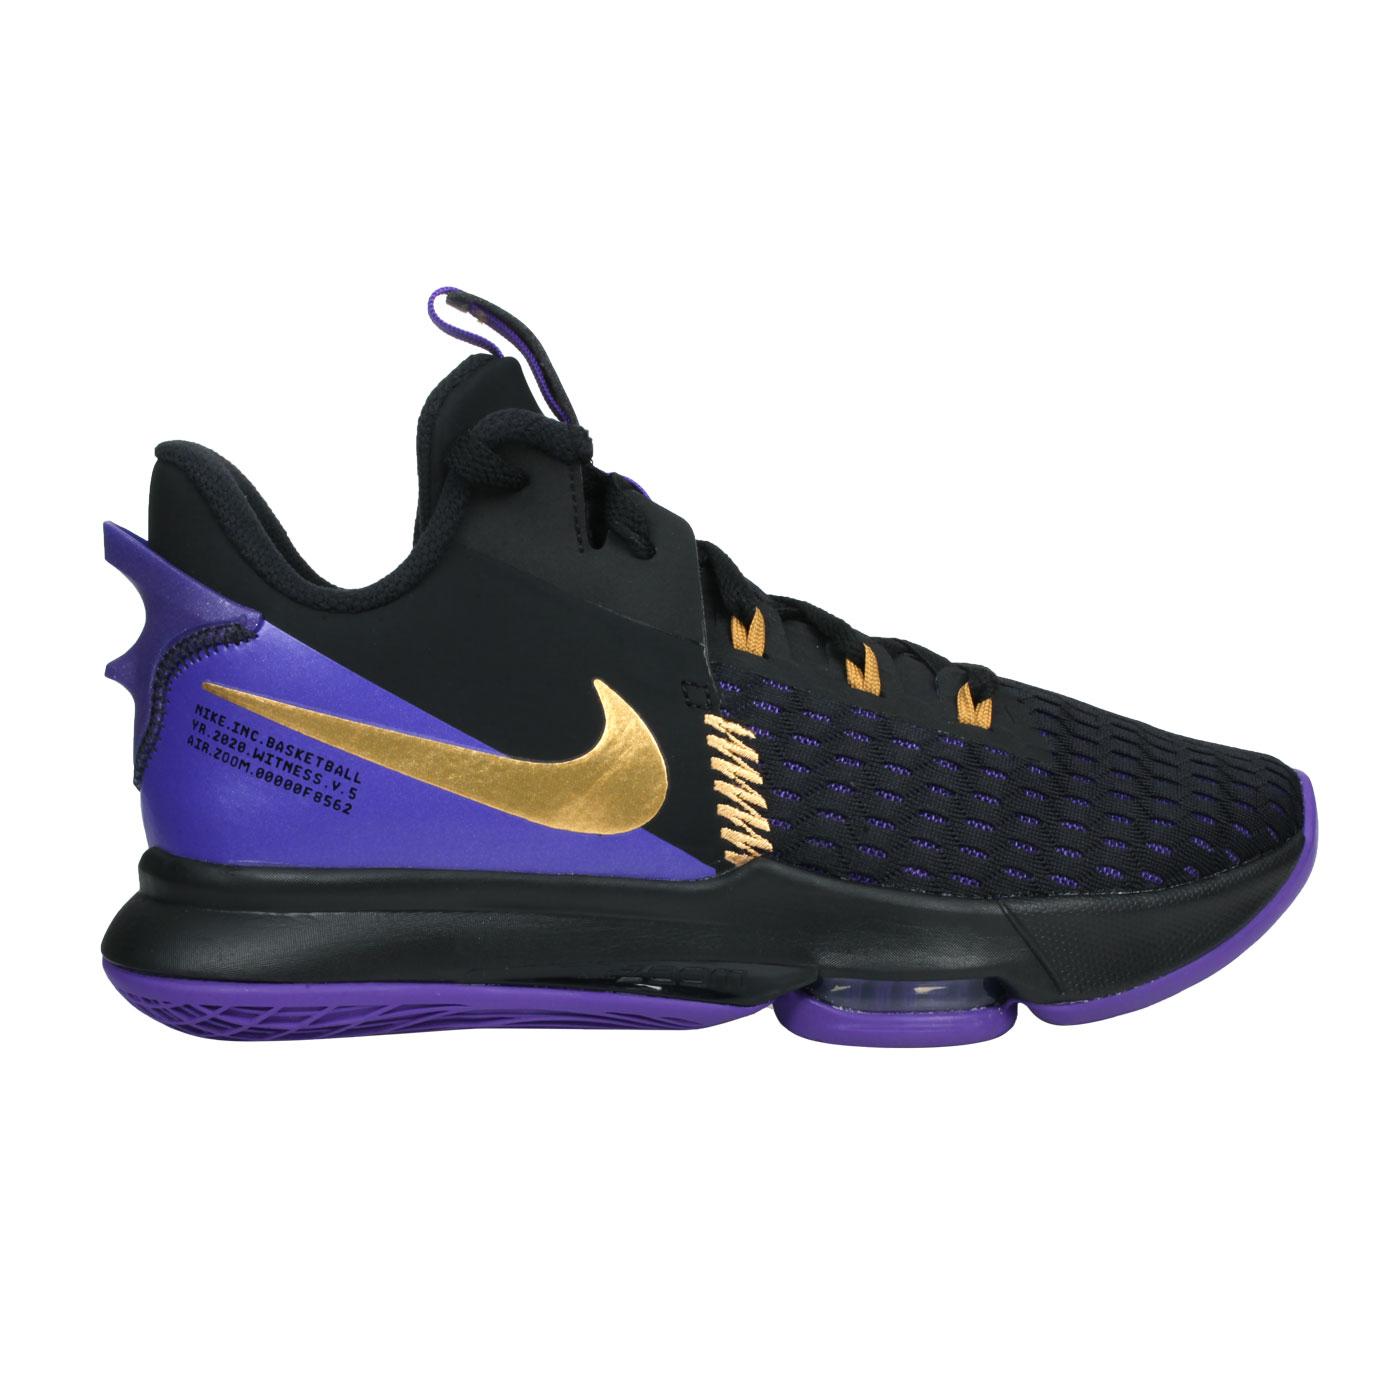 NIKE 男款籃球鞋  @LEBRON WITNESS V EP@CQ9381001 - 黑紫金